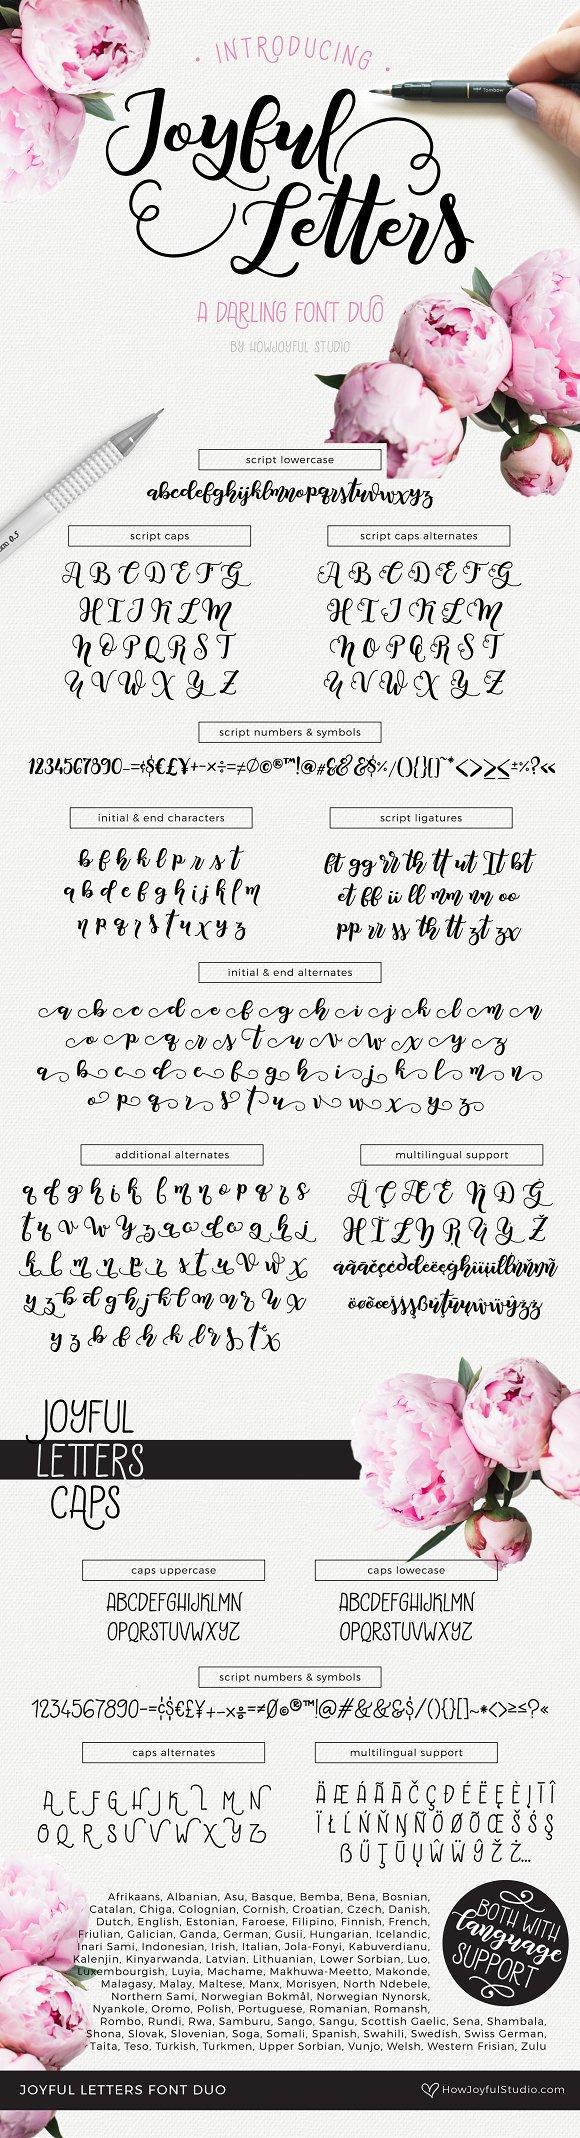 Joyful Letters Font Duo Script Fonts Creative Market